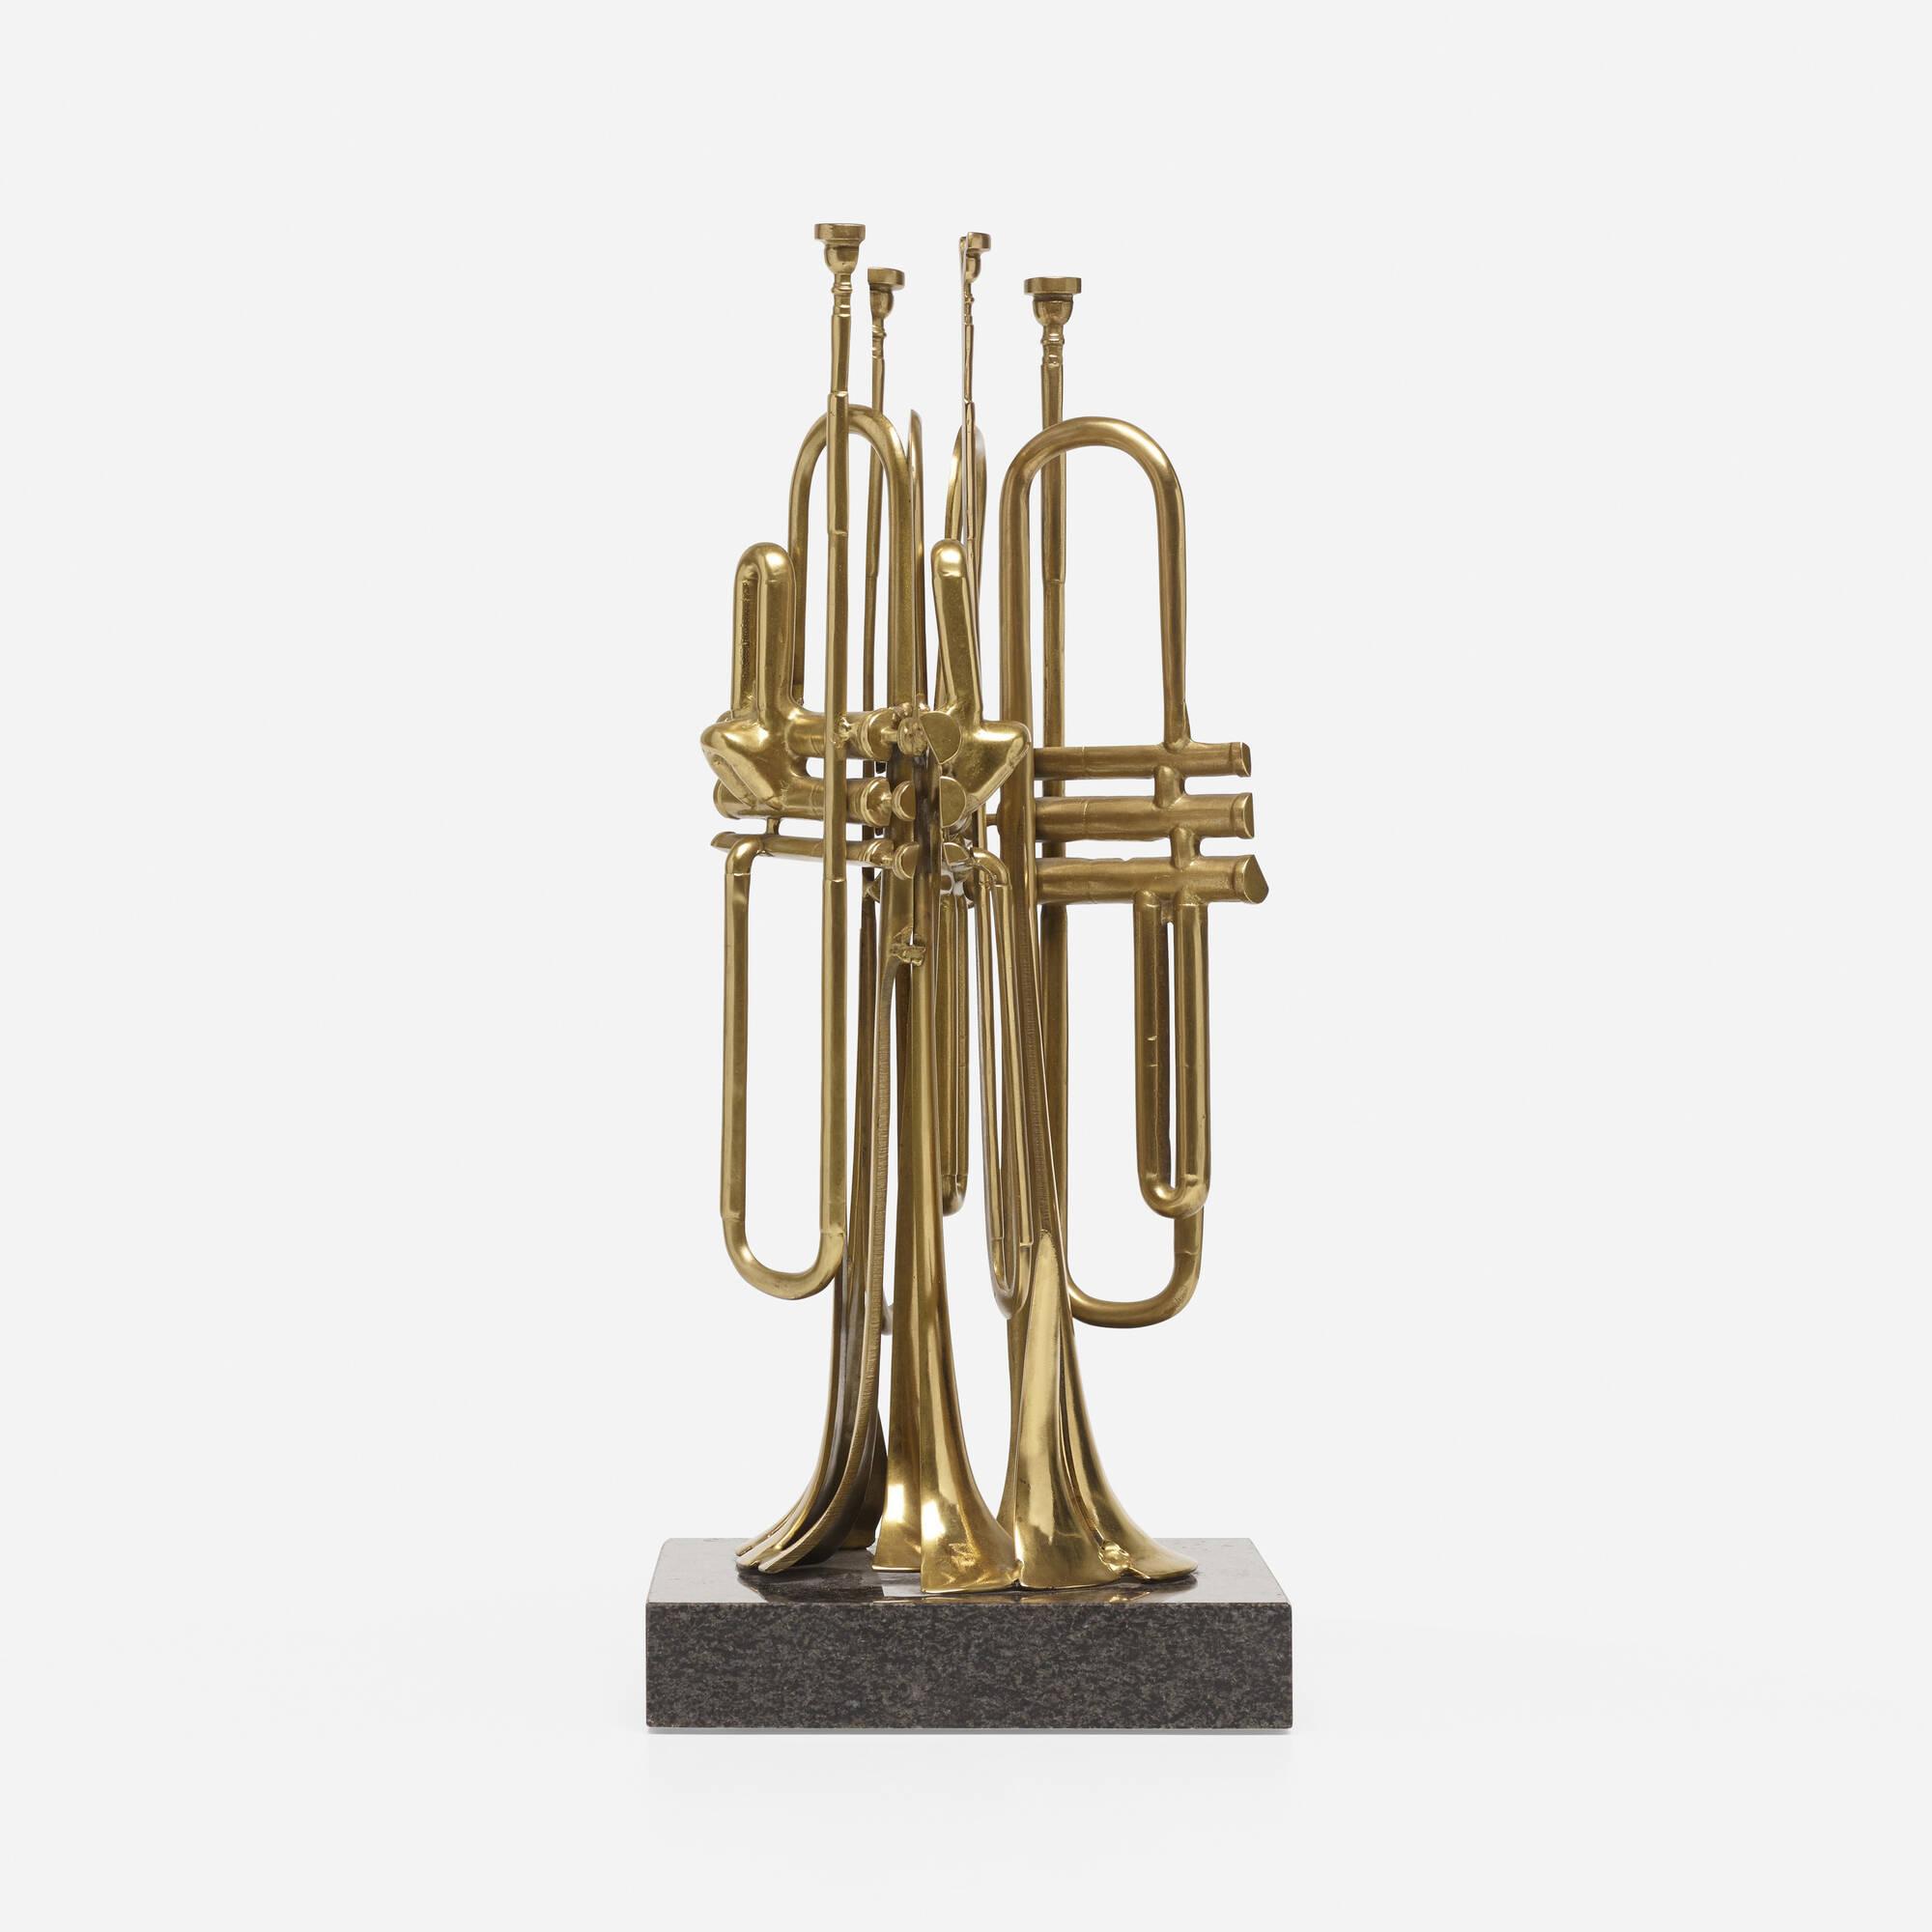 169: Arman / Sliced Trumpets (2 of 3)